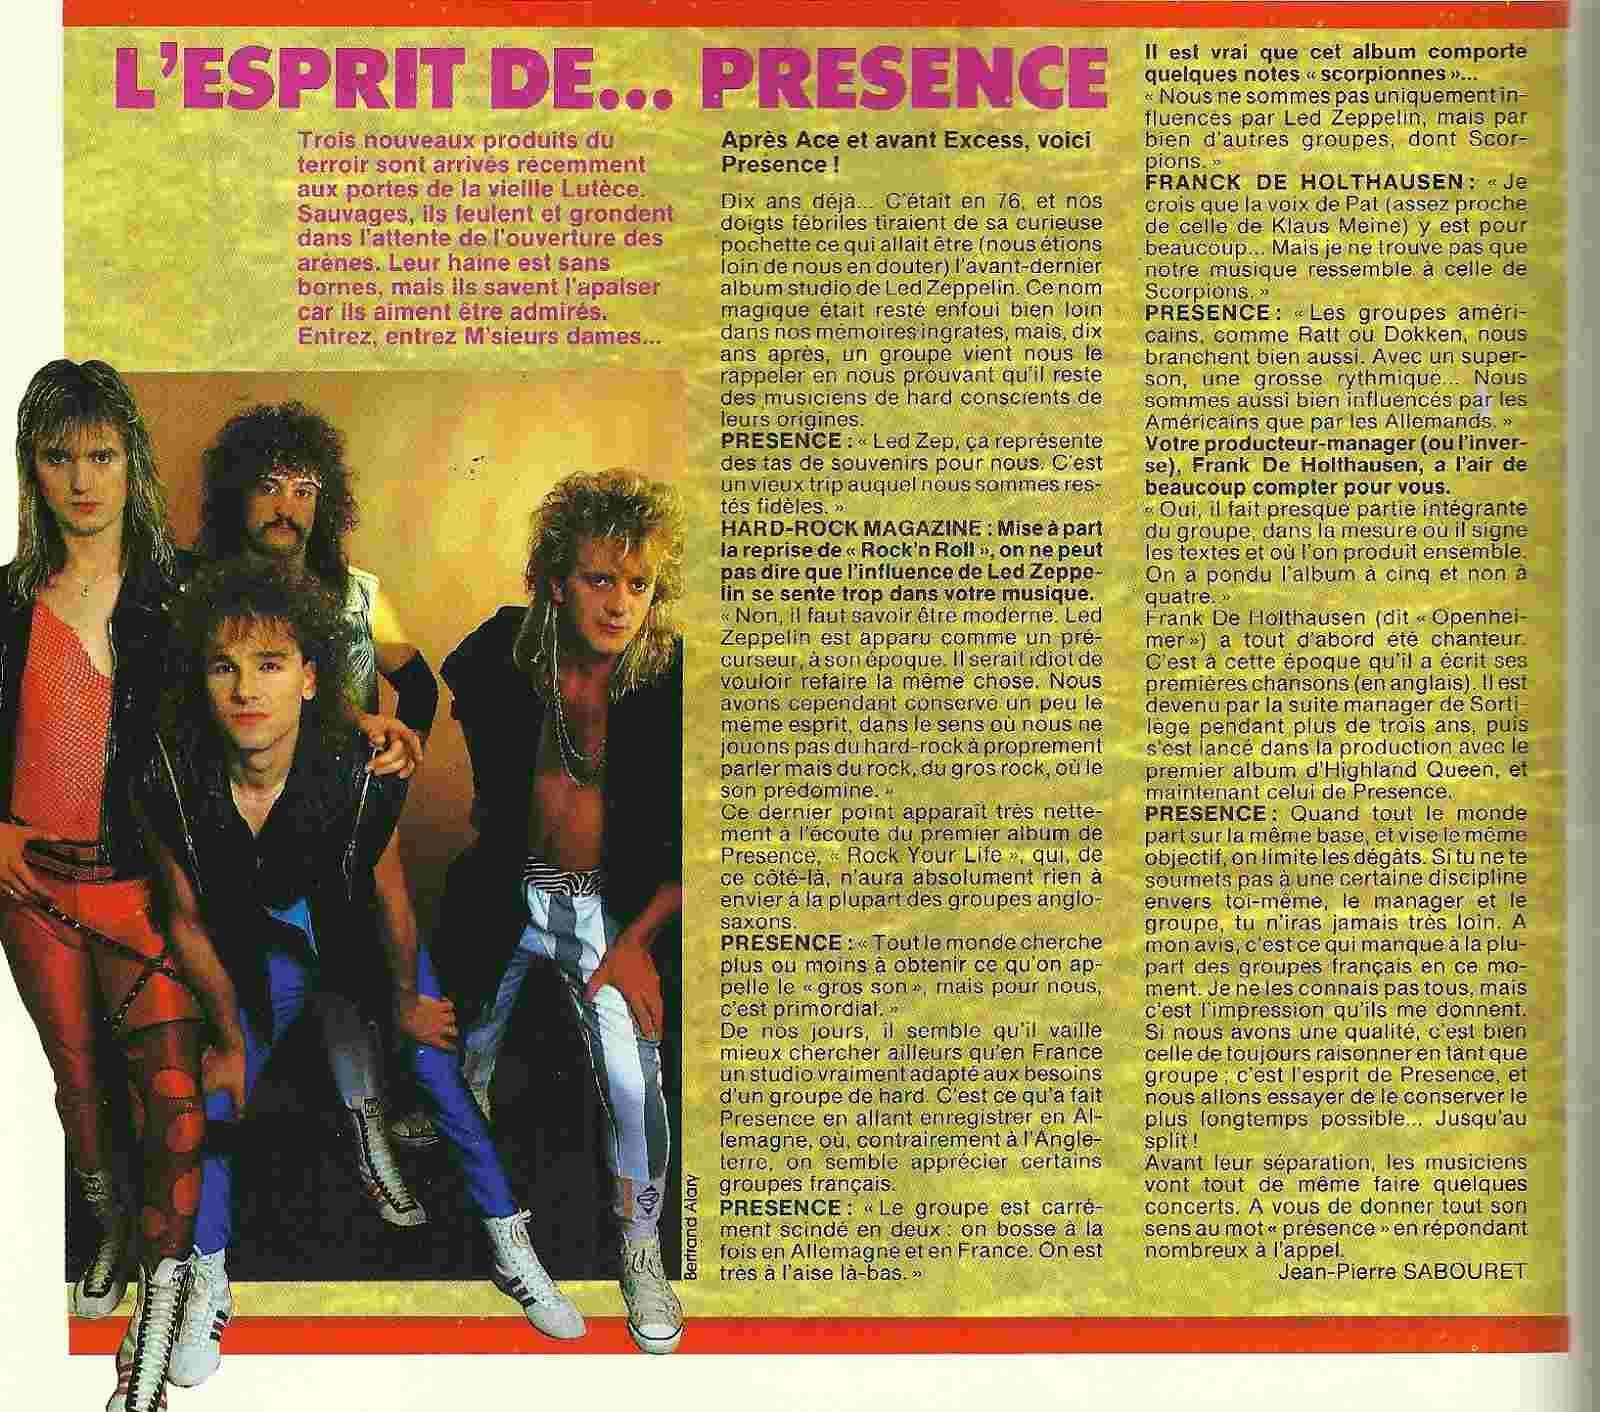 PRESENCE Rock Your Life (1986-2015) Glam Rock Numyri24